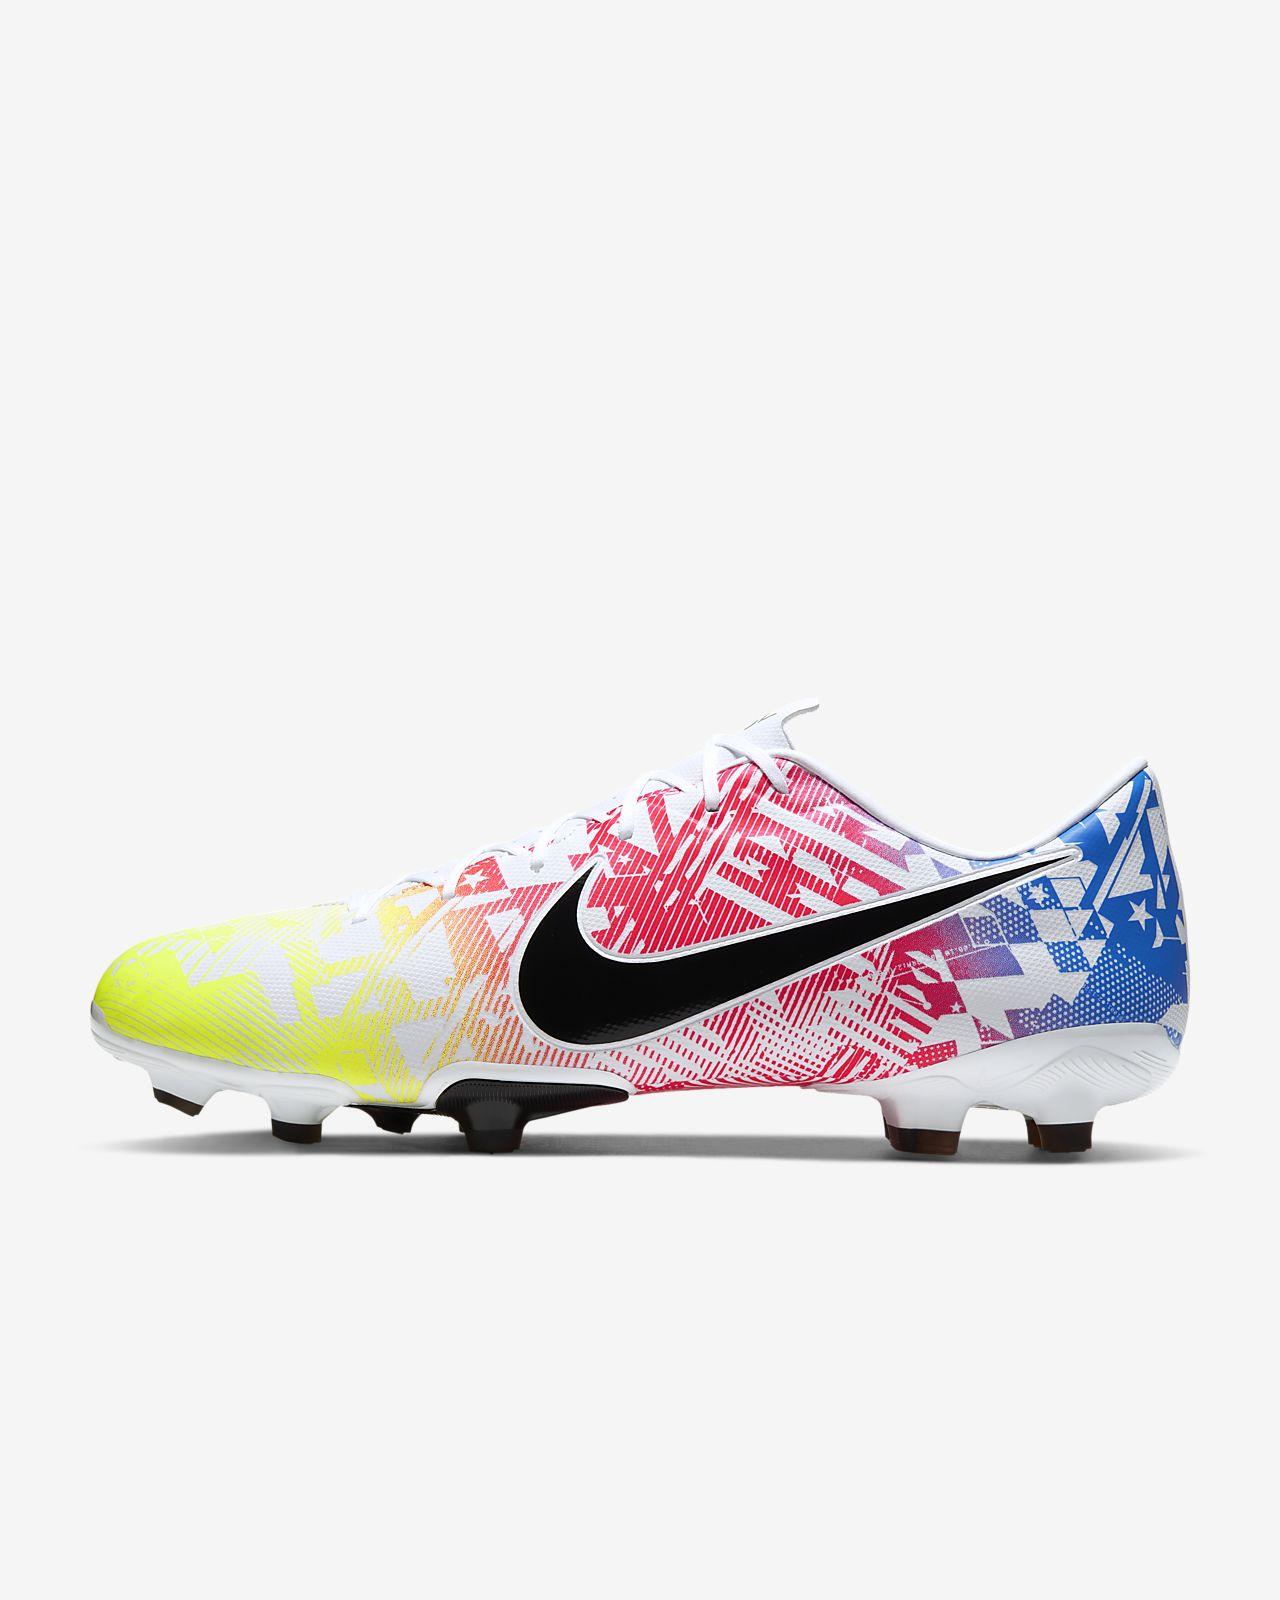 Nike Mercurial Vapor 13 Academy Neymar Jr. MG Multi-Ground Soccer Cleat